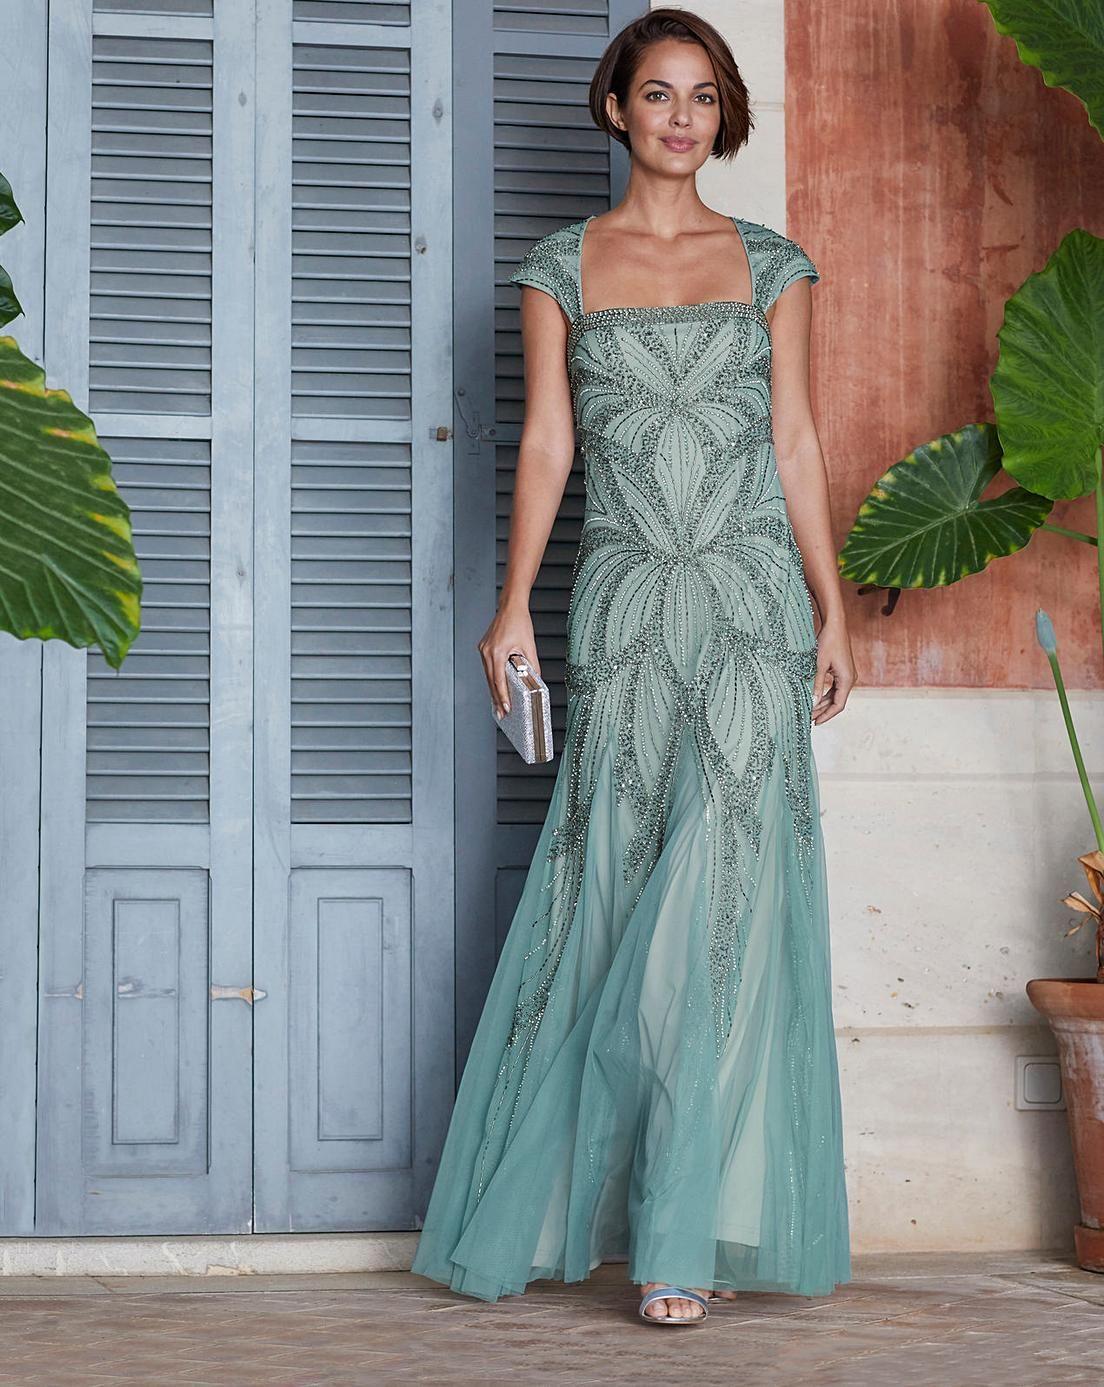 Joanna Hope Beaded Maxi Dress Beaded Maxi Dress 1920s Evening Dress Classy Dress [ 1387 x 1104 Pixel ]